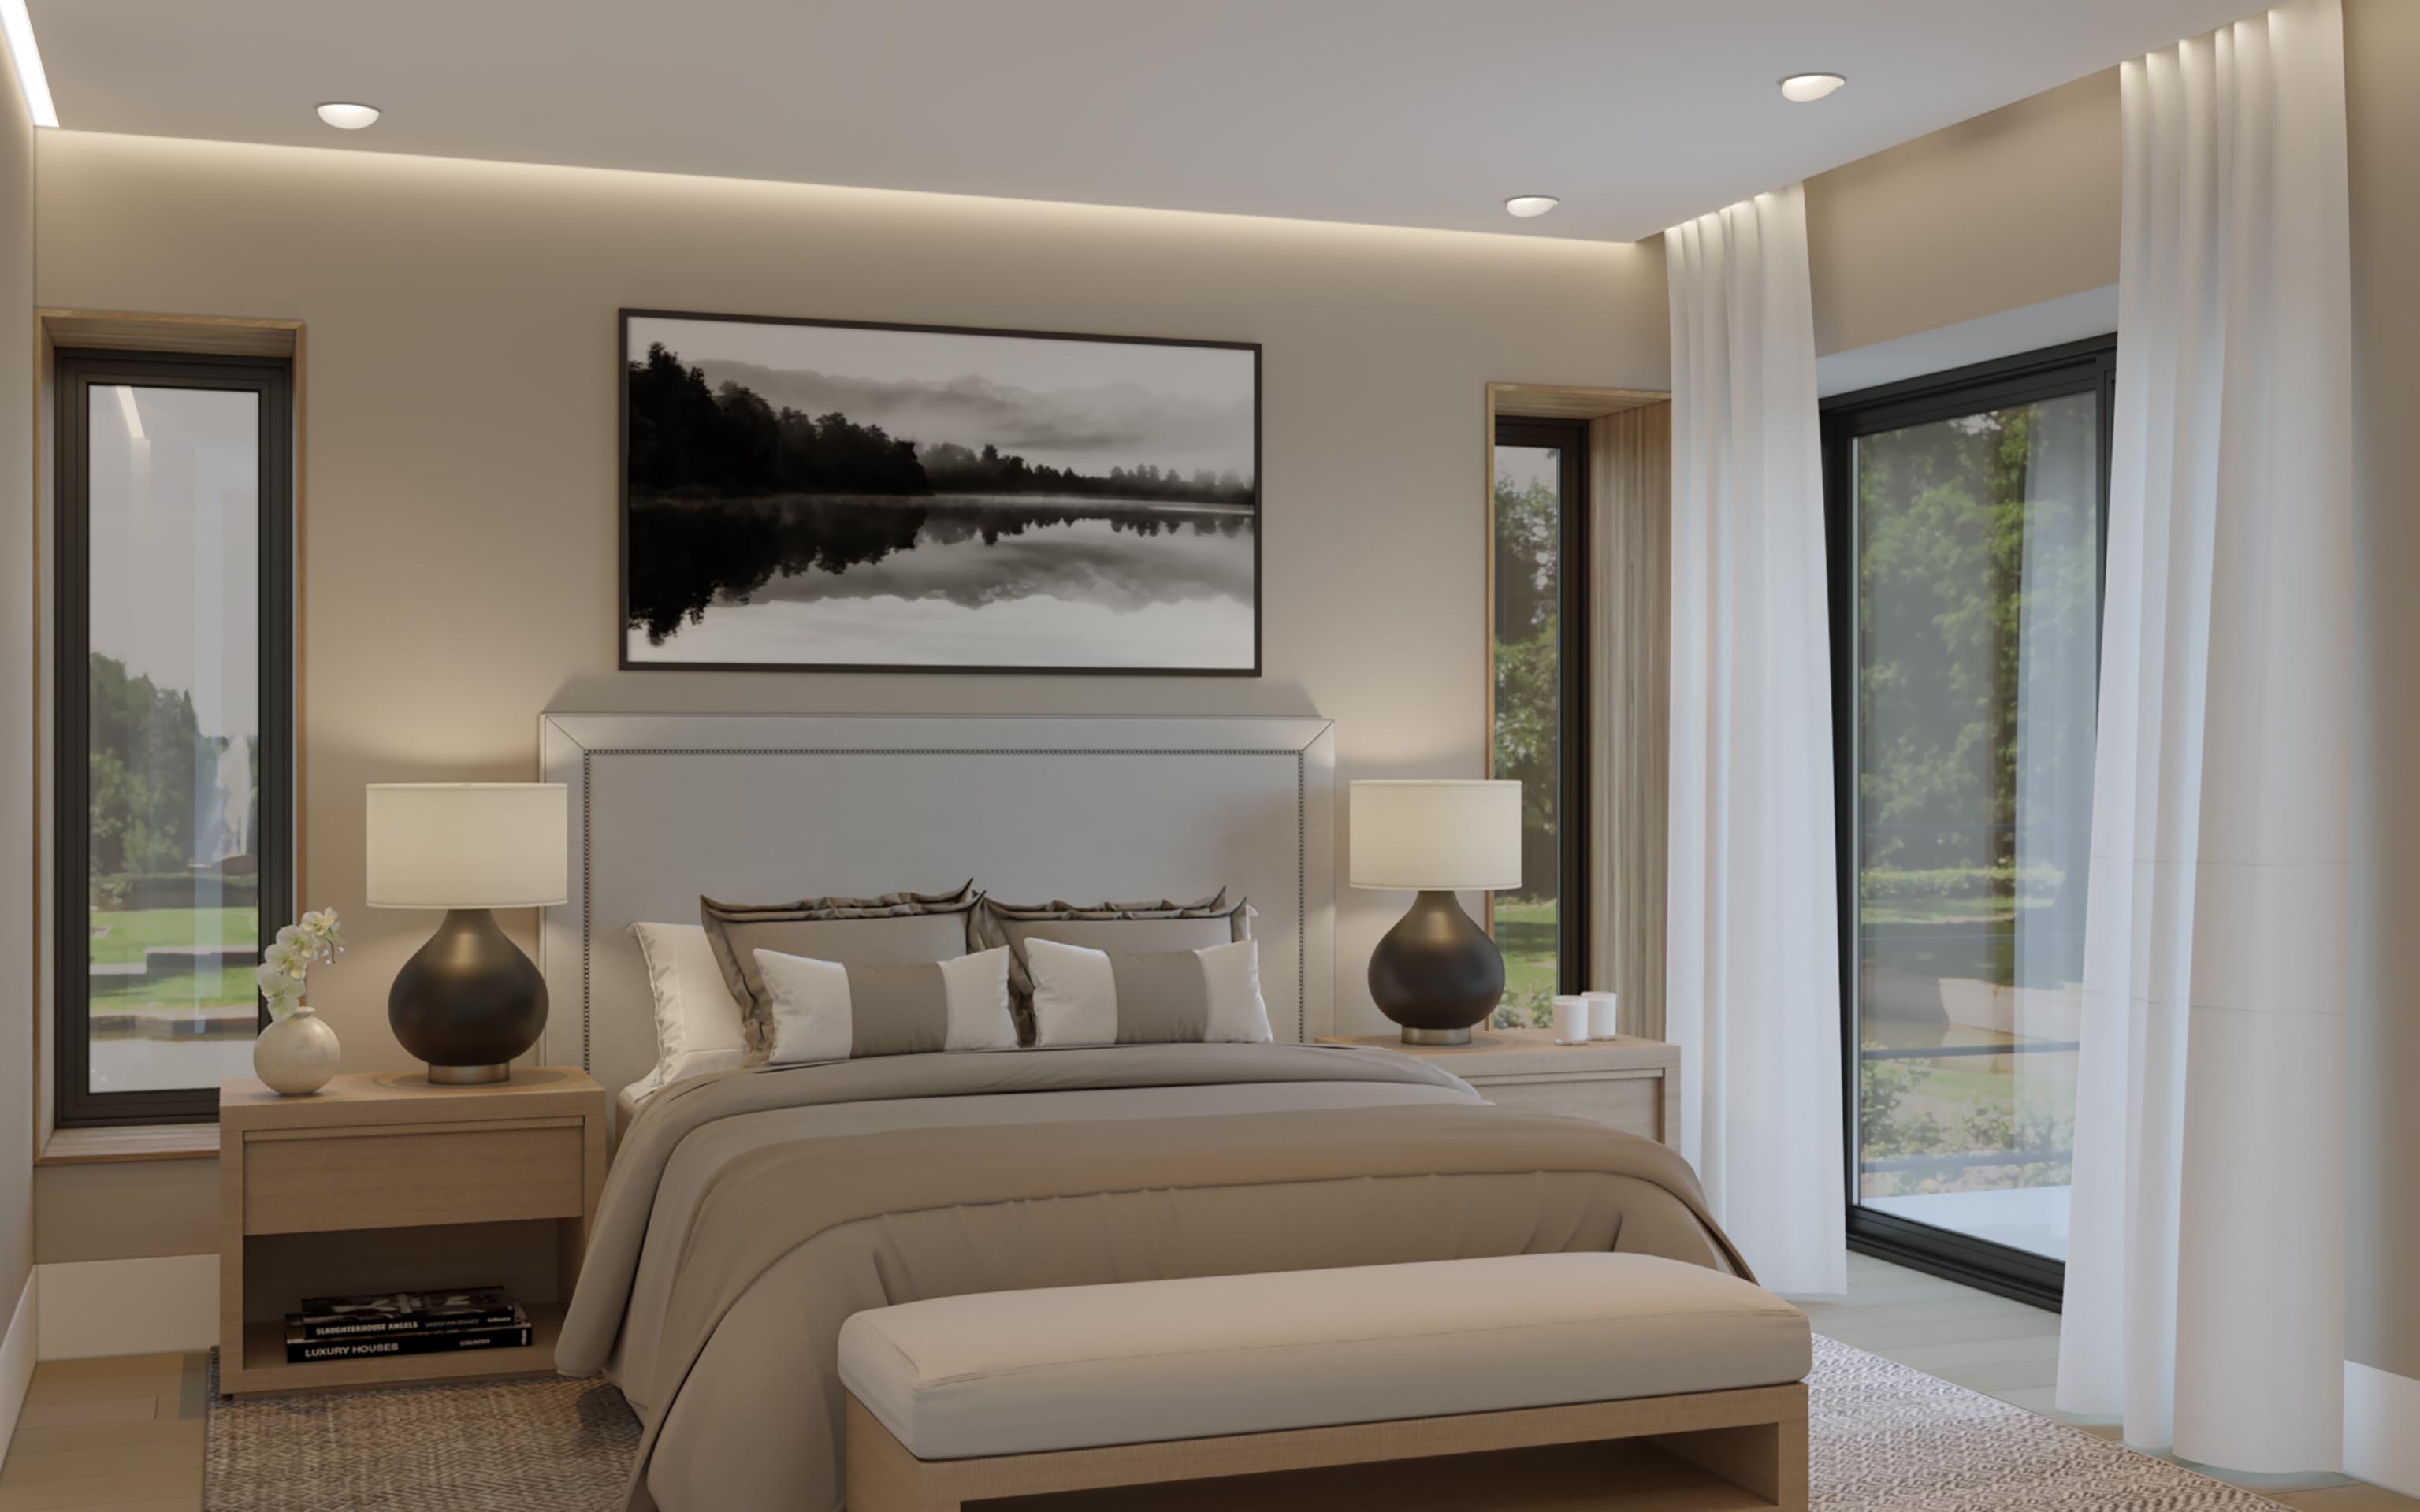 Interiorismo vivienda suecia alfonso p rez lvarez for Programas 3d interiorismo